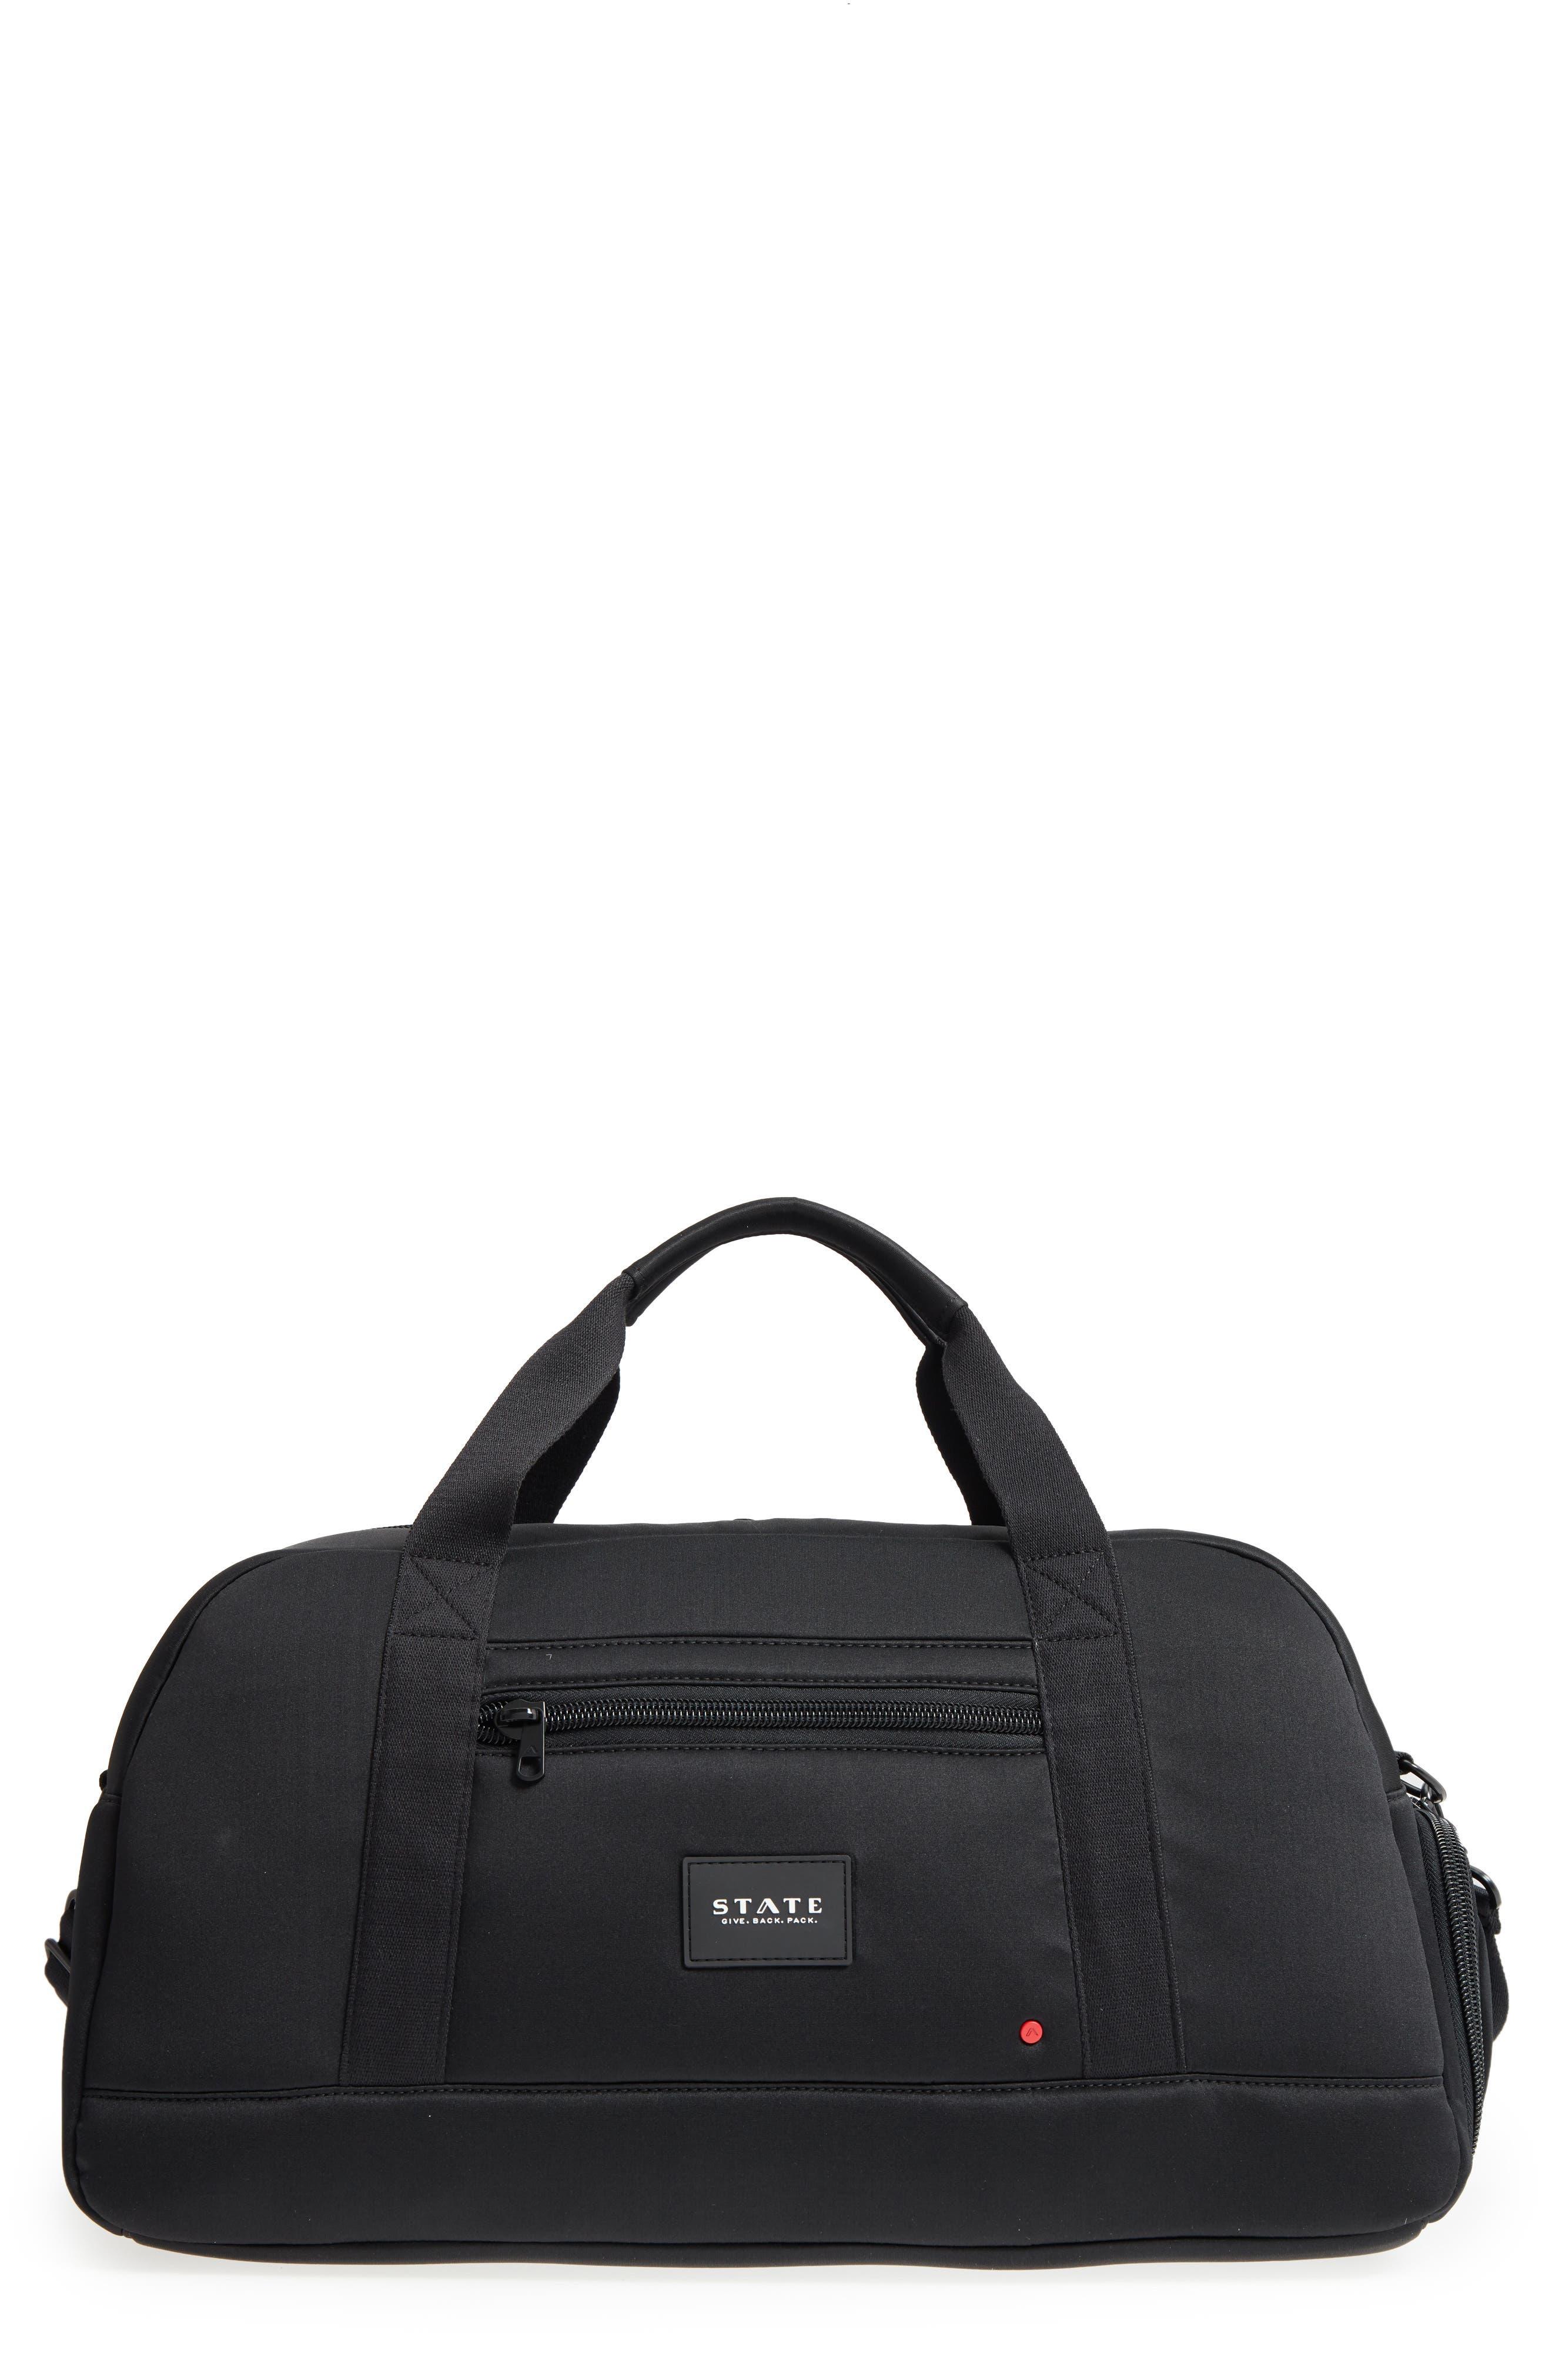 Franklin Neoprene Duffel Bag,                             Main thumbnail 1, color,                             Black